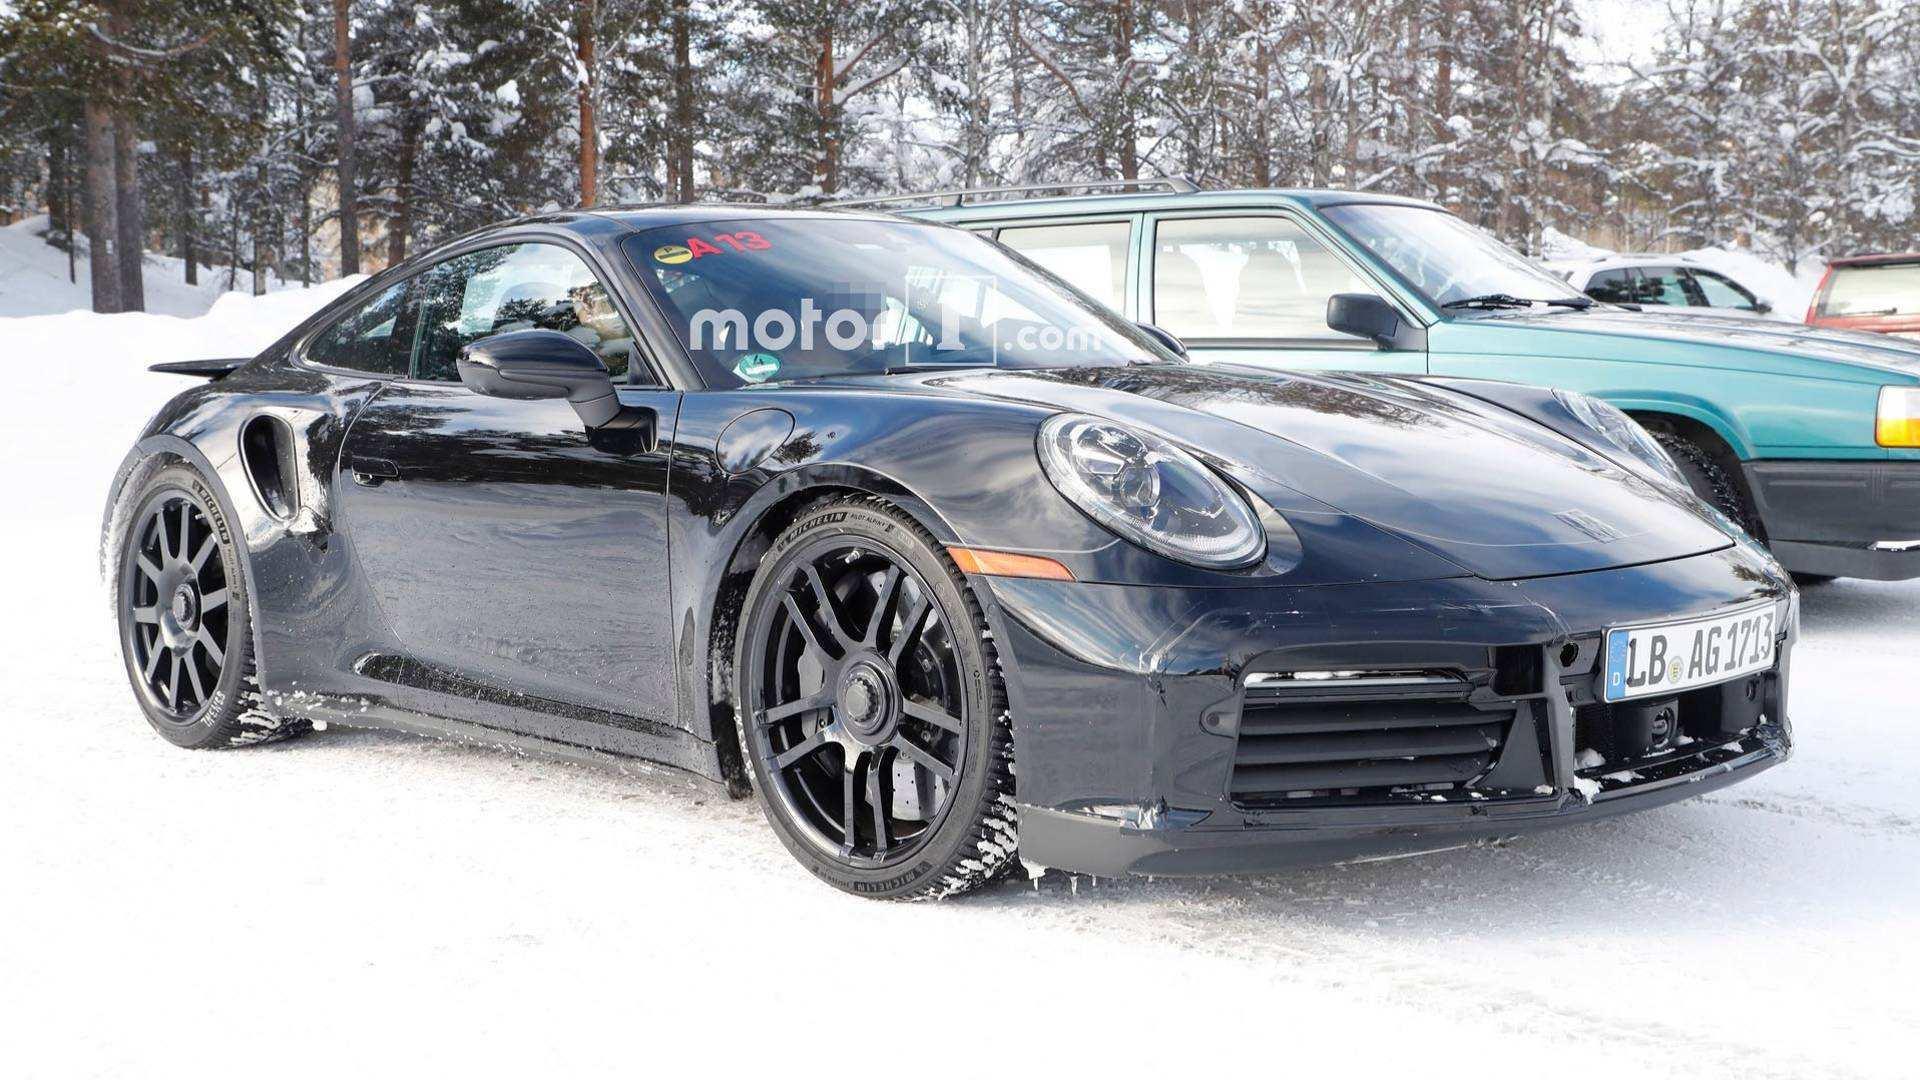 20 All New 2020 Porsche 911 Gt3 Redesign by 2020 Porsche 911 Gt3